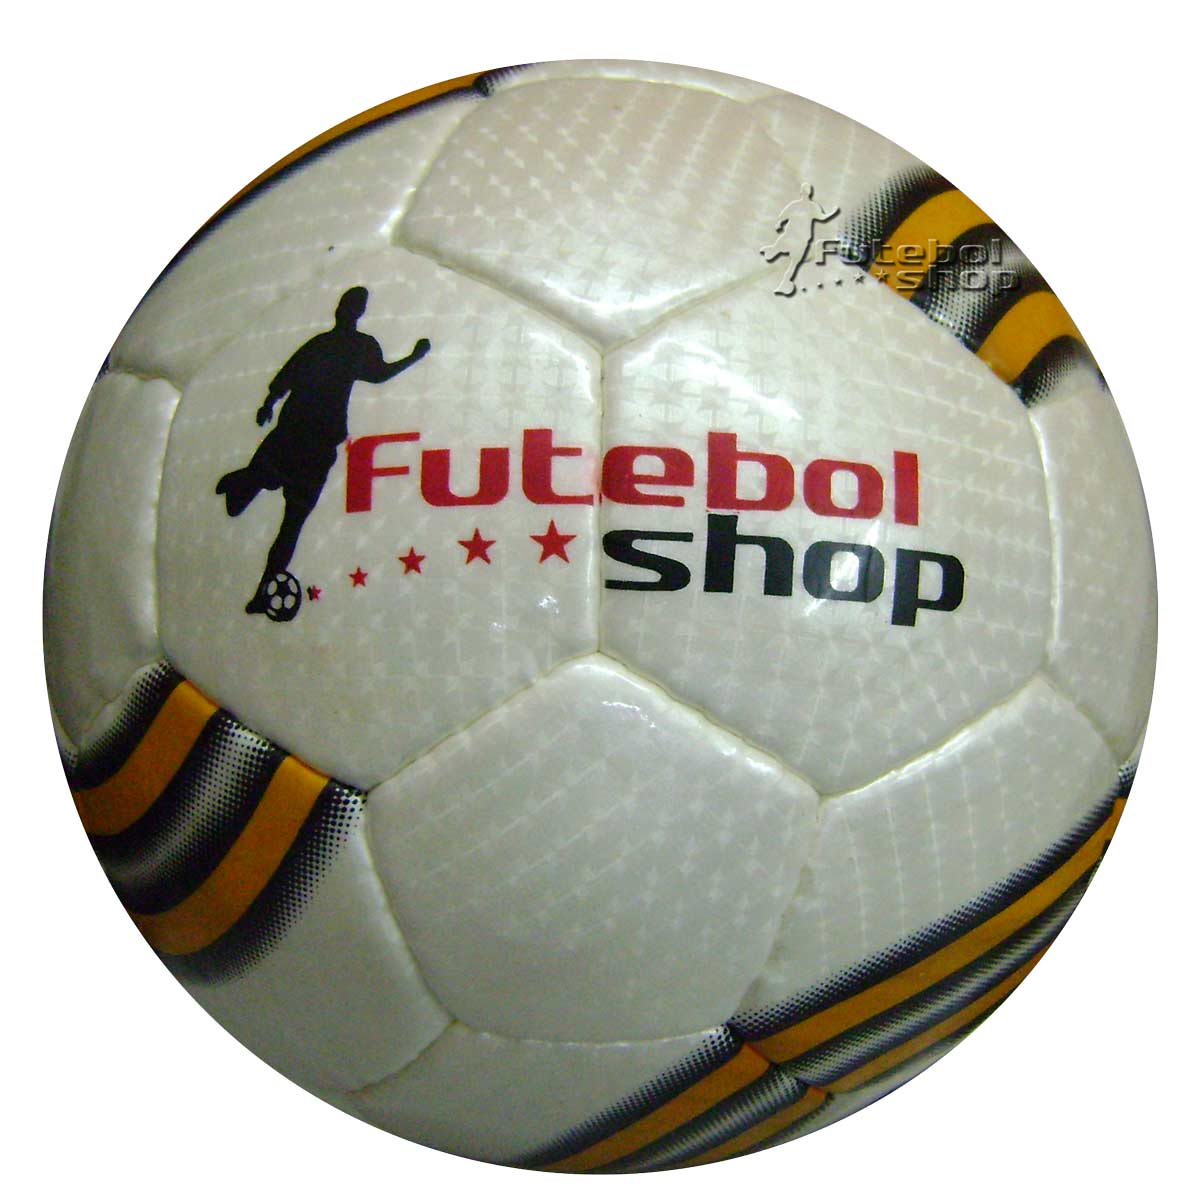 1980a4f1977d2 Bola Futsal GS100 Sub 11 Costurada Futebol Shop